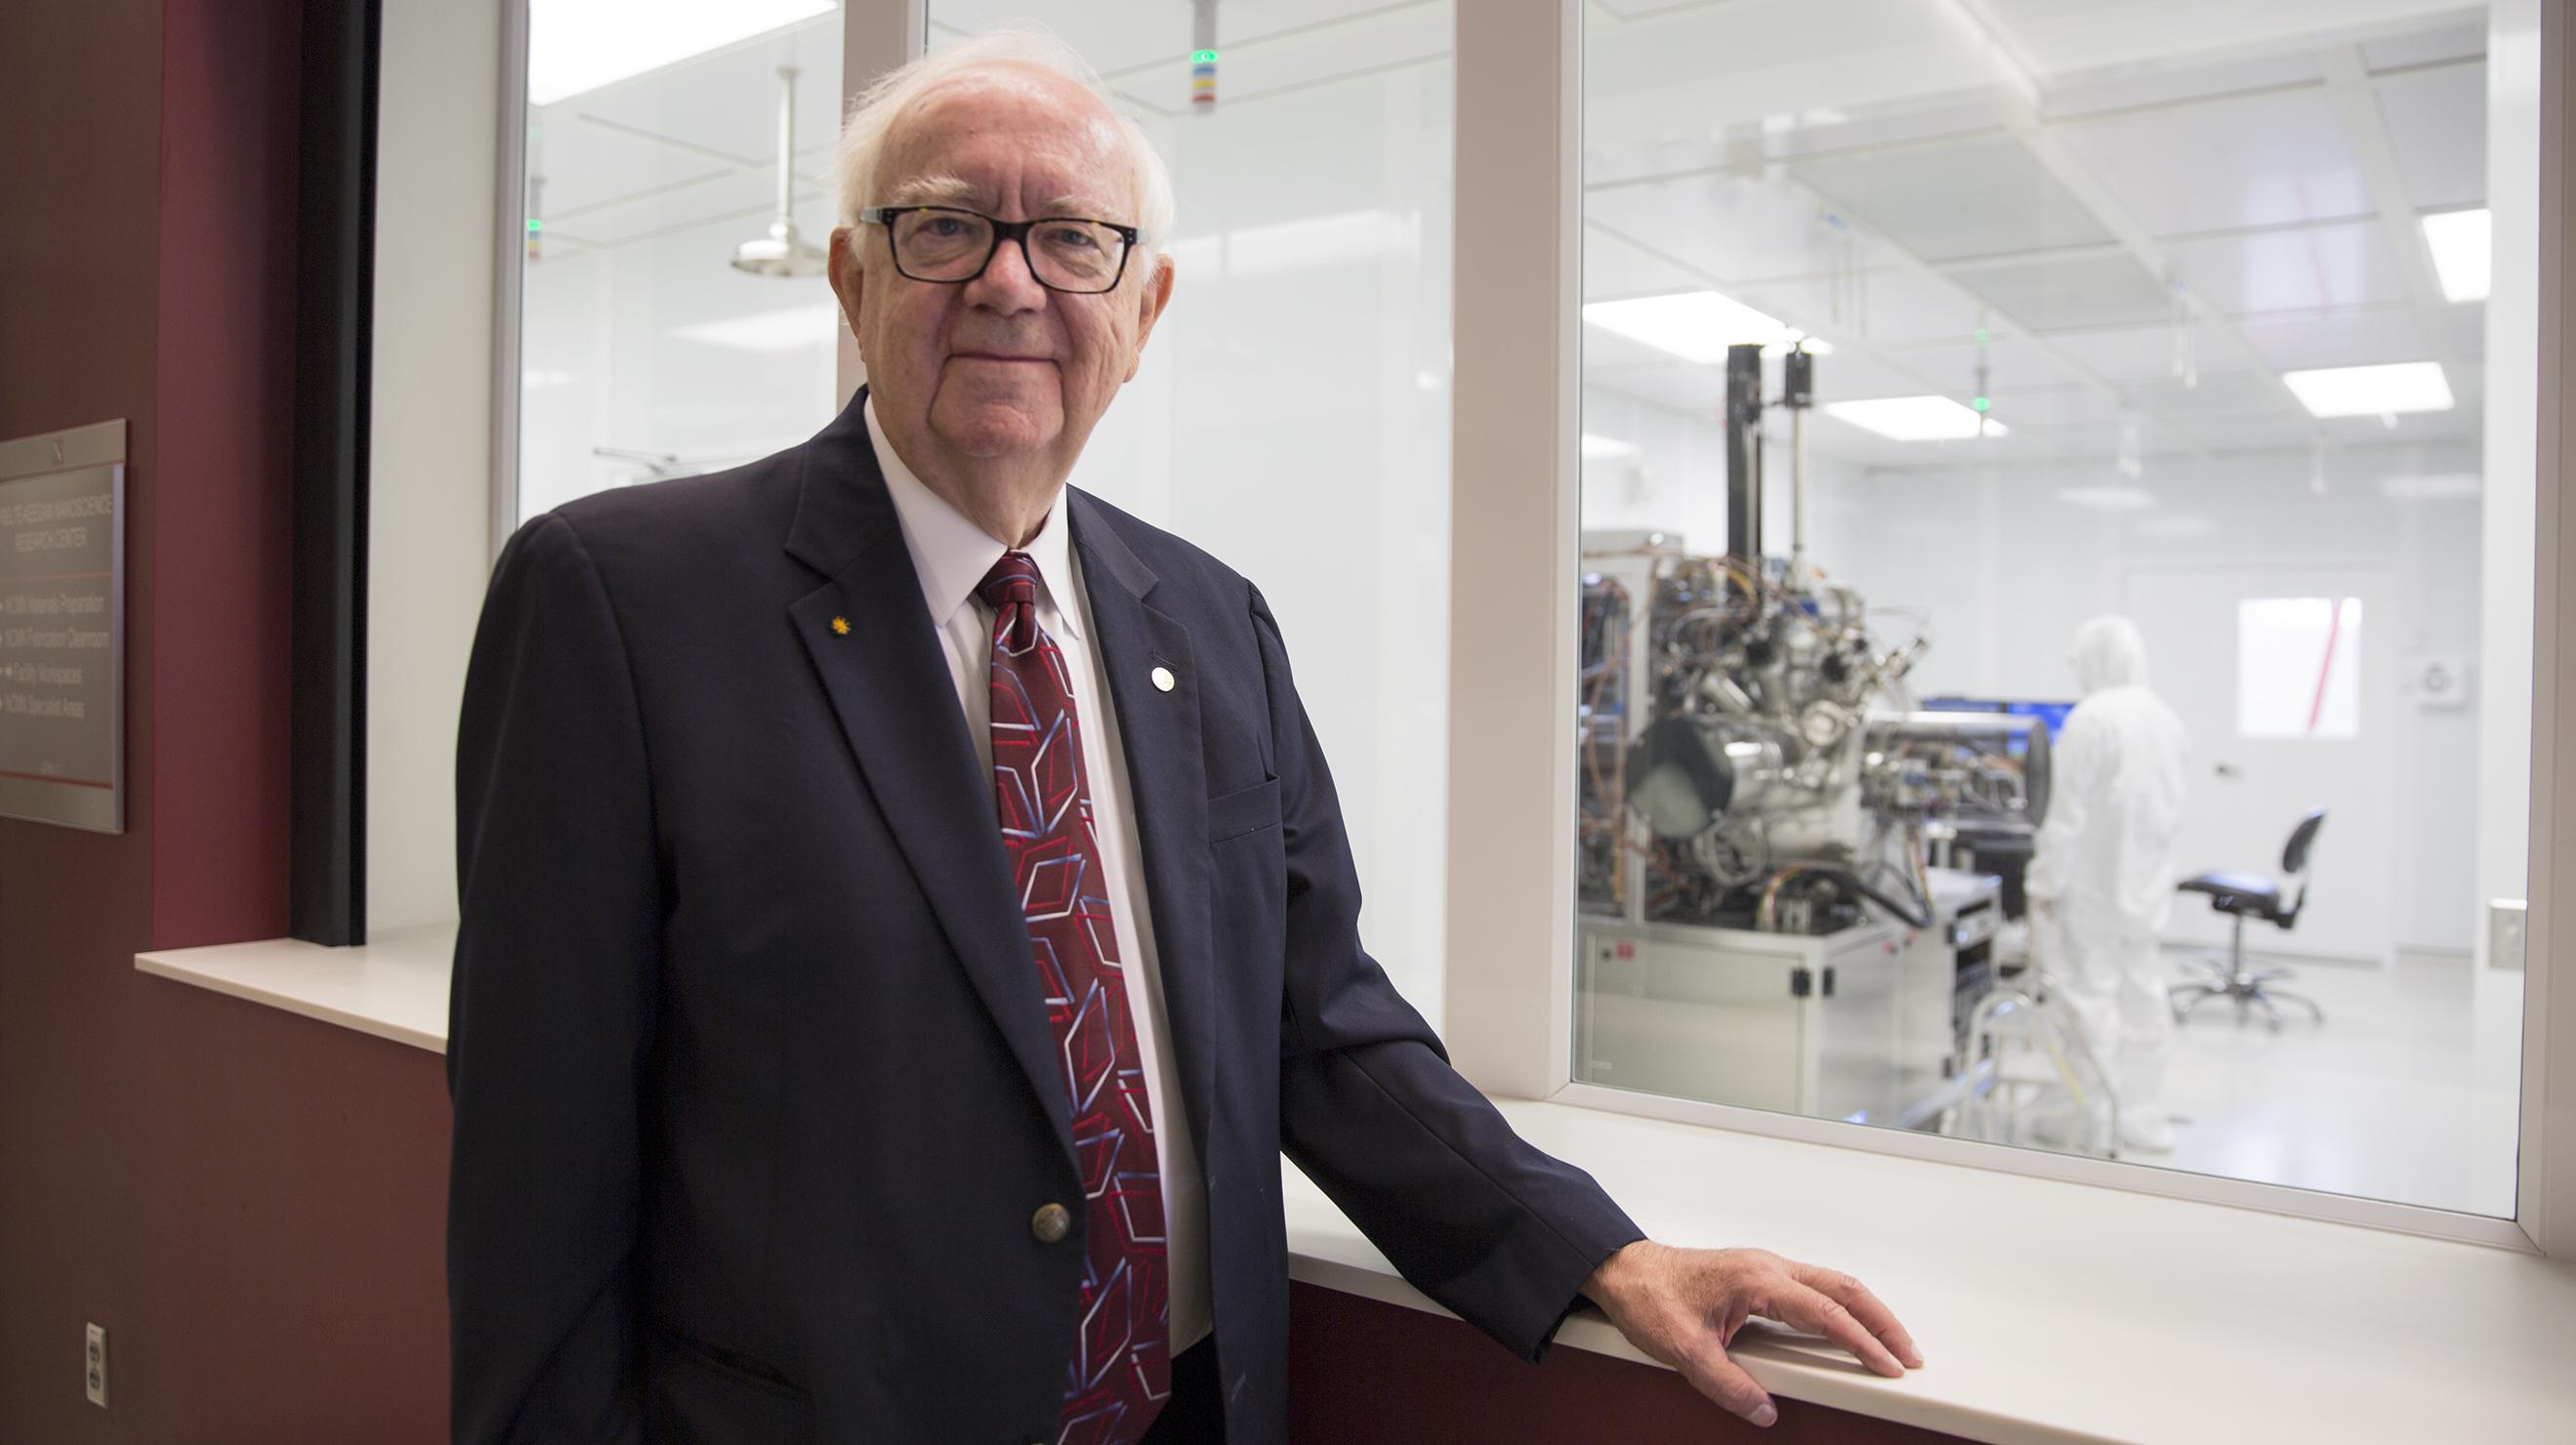 unl wins million nsf grant for regional nanoscience center david sellmyer troy fedderson university communications